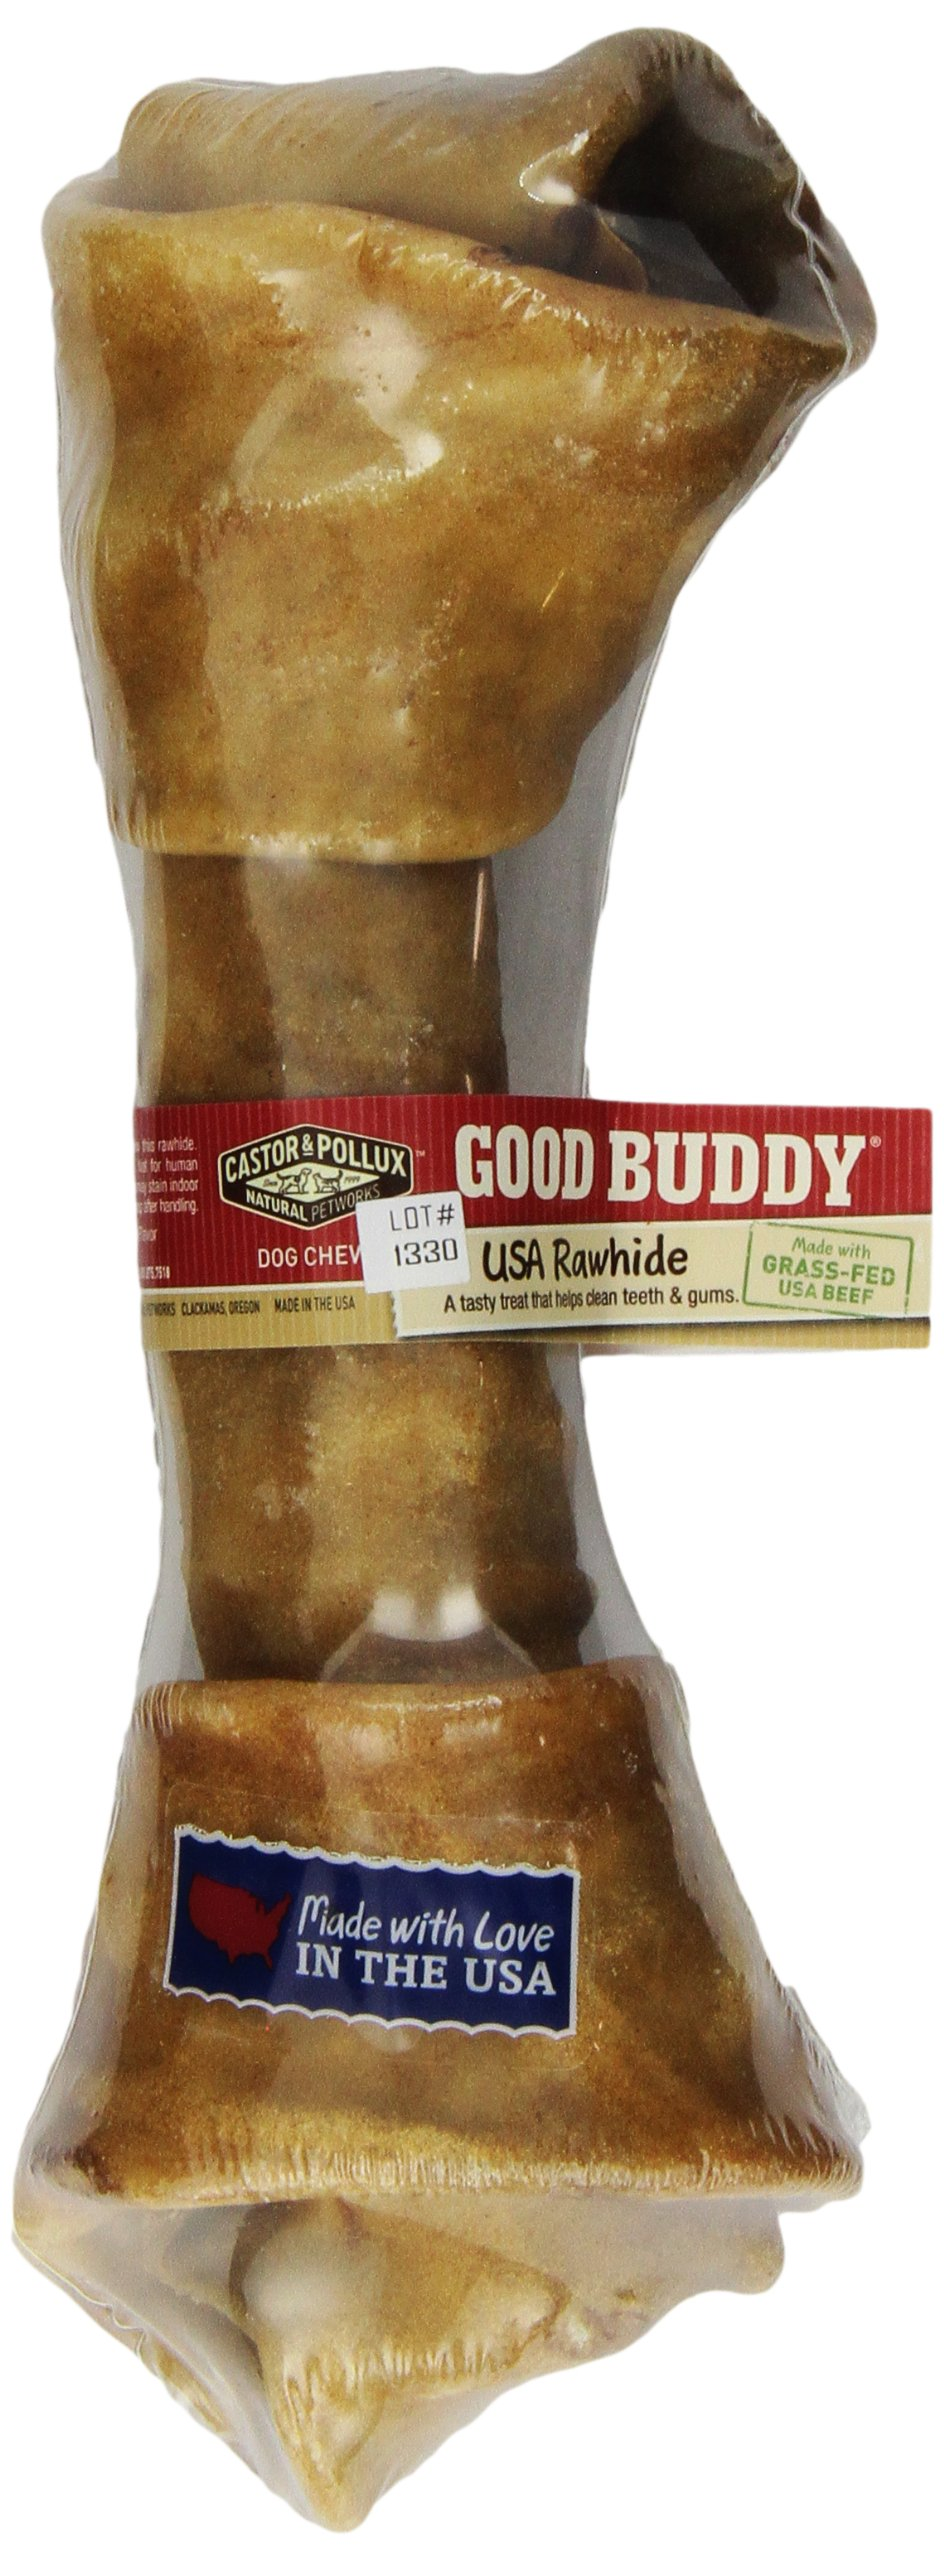 Castor & Pollux Good Buddy USA Rawhide Bone, 10-11 inch Pack of 5 by Good Buddy